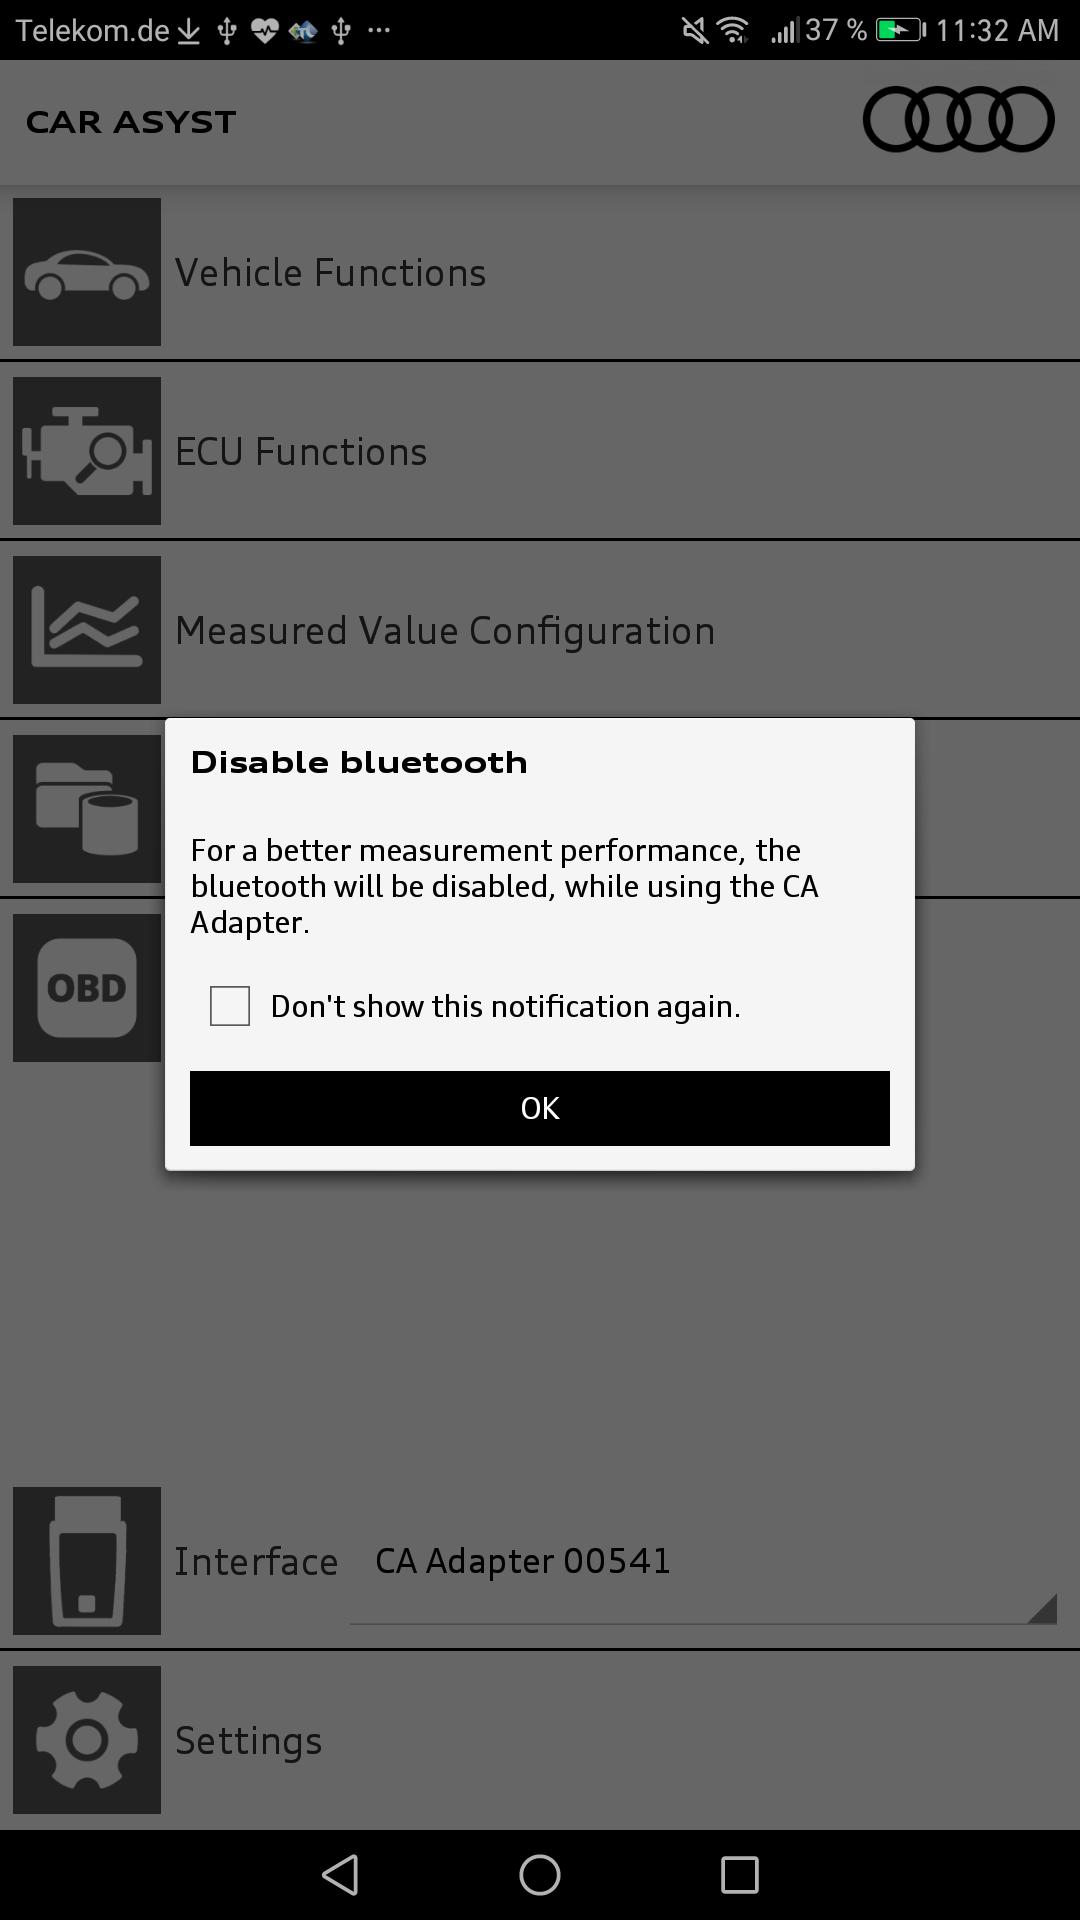 CAR ASYST Deactivate Bluetooth